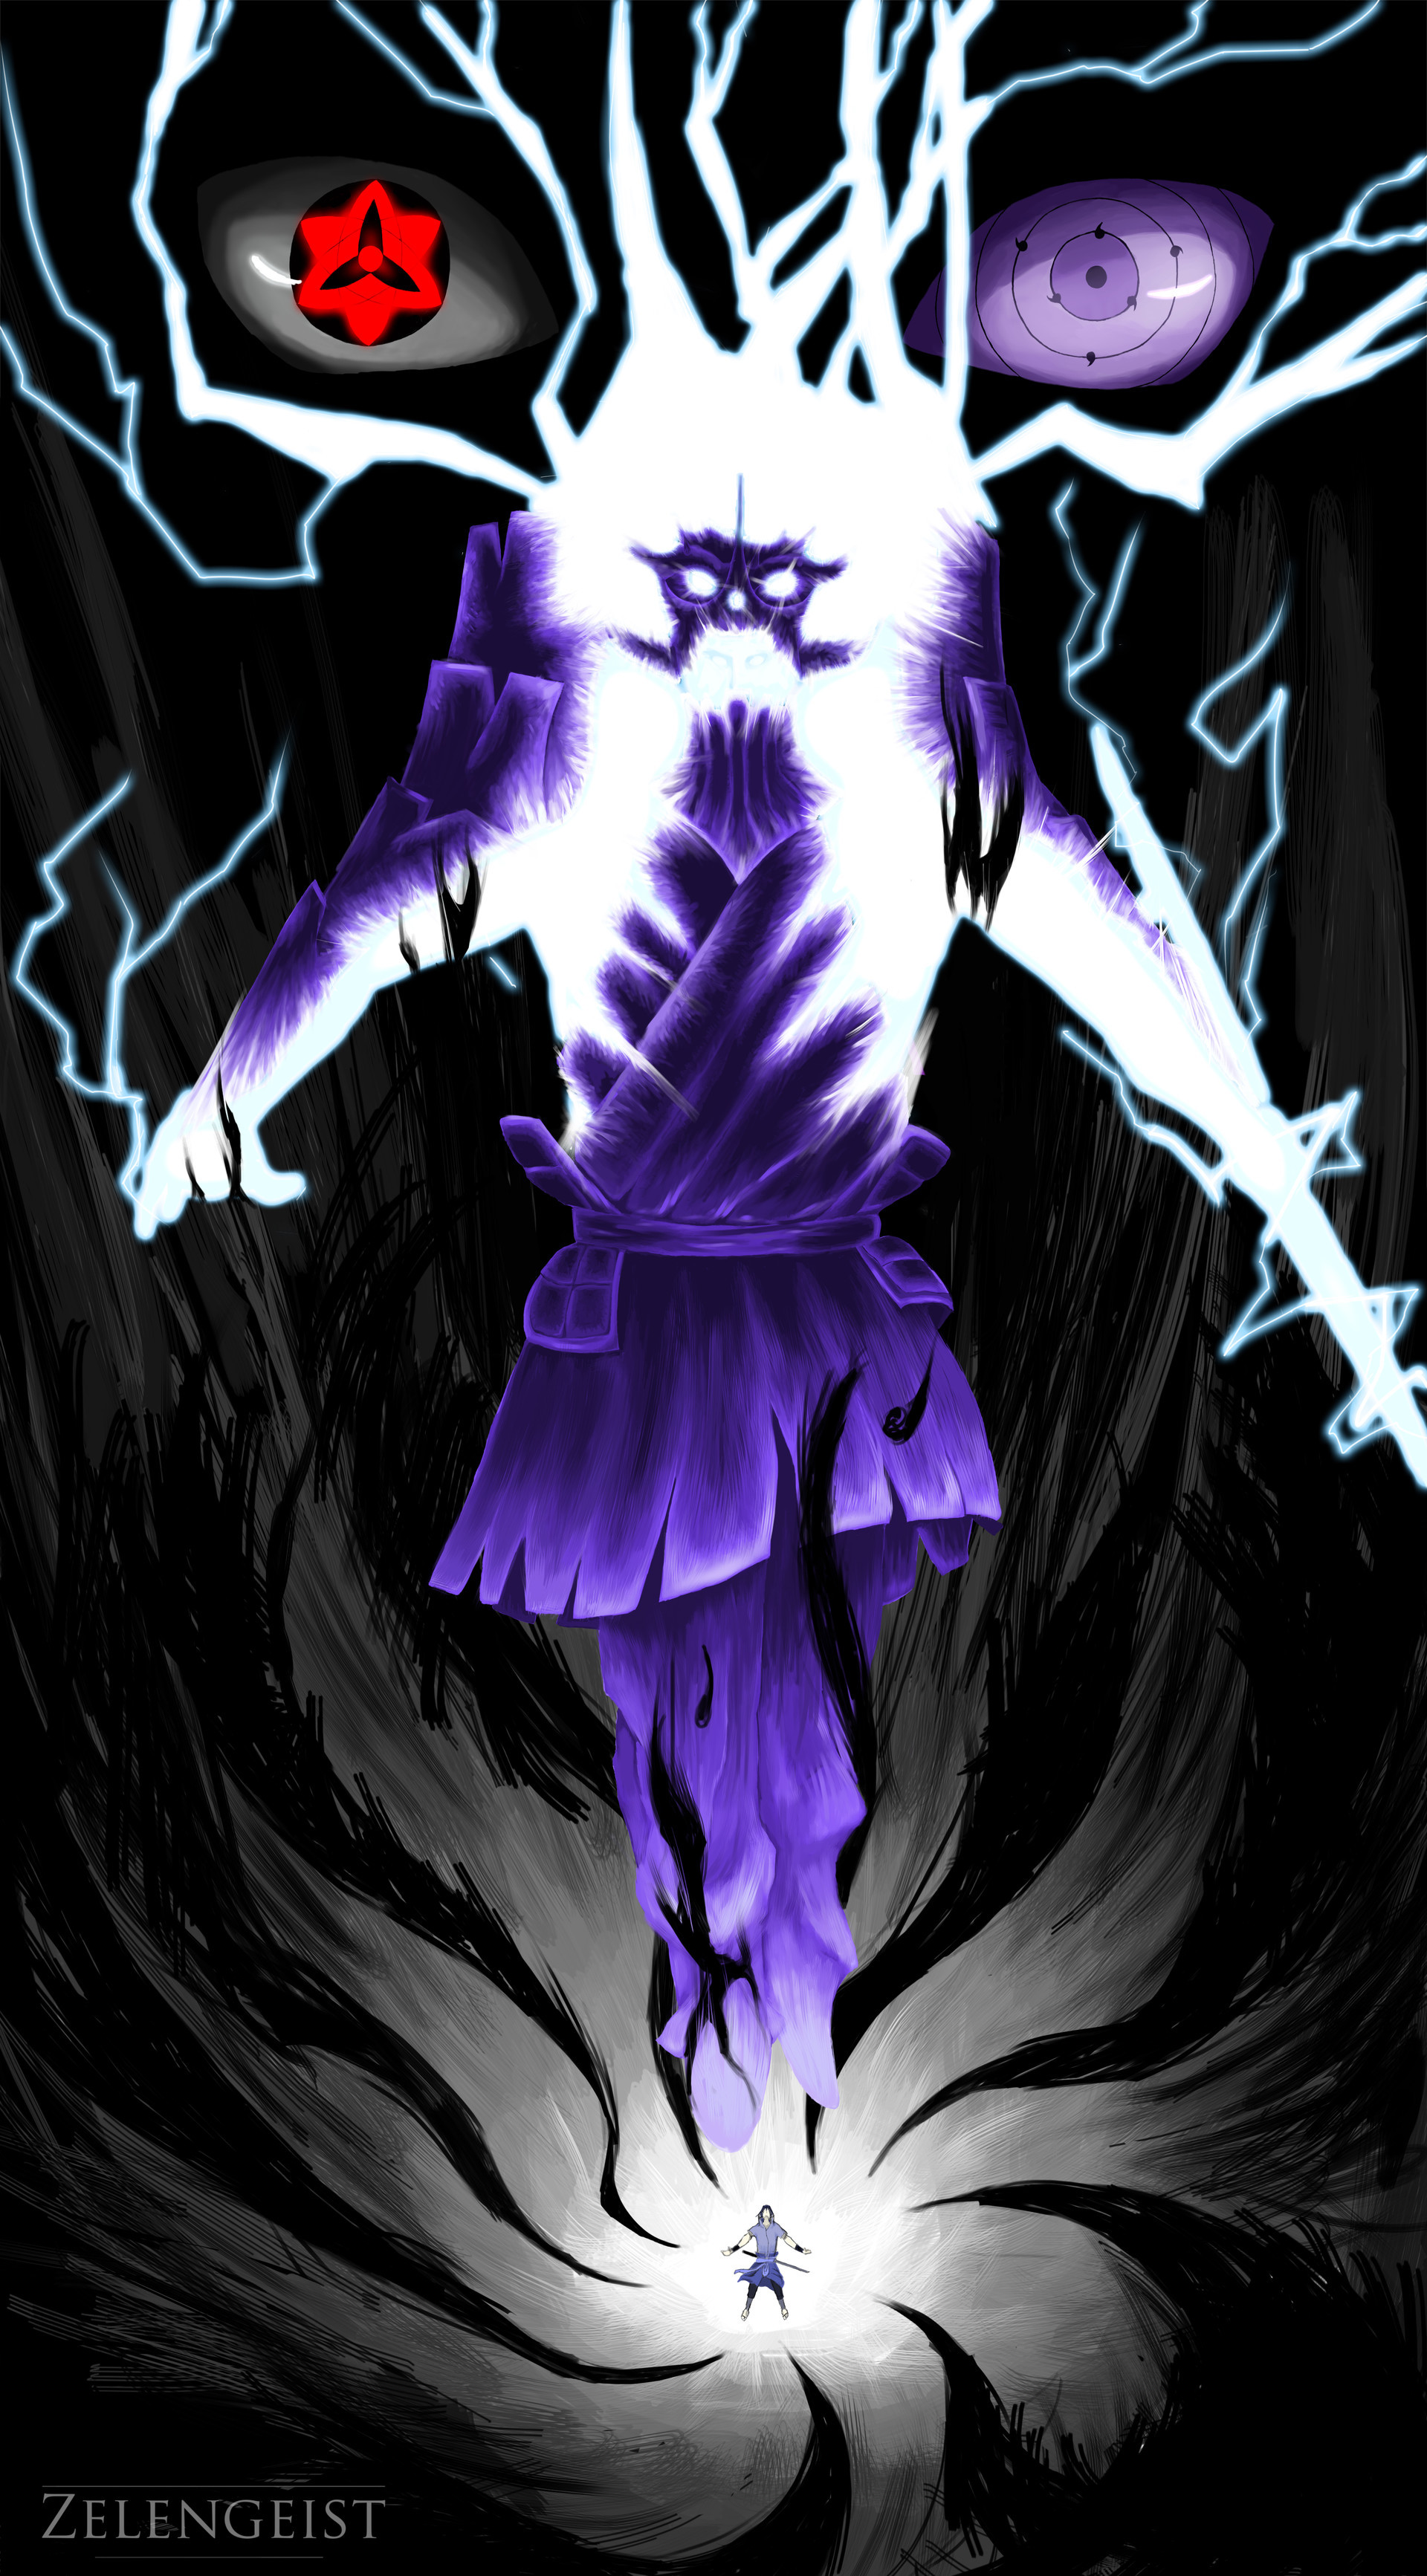 Best Wallpaper Naruto Purple - 812274-download-naruto-shippuden-wallpaper-sasuke-1920x3467-mac  Image_96815.jpg